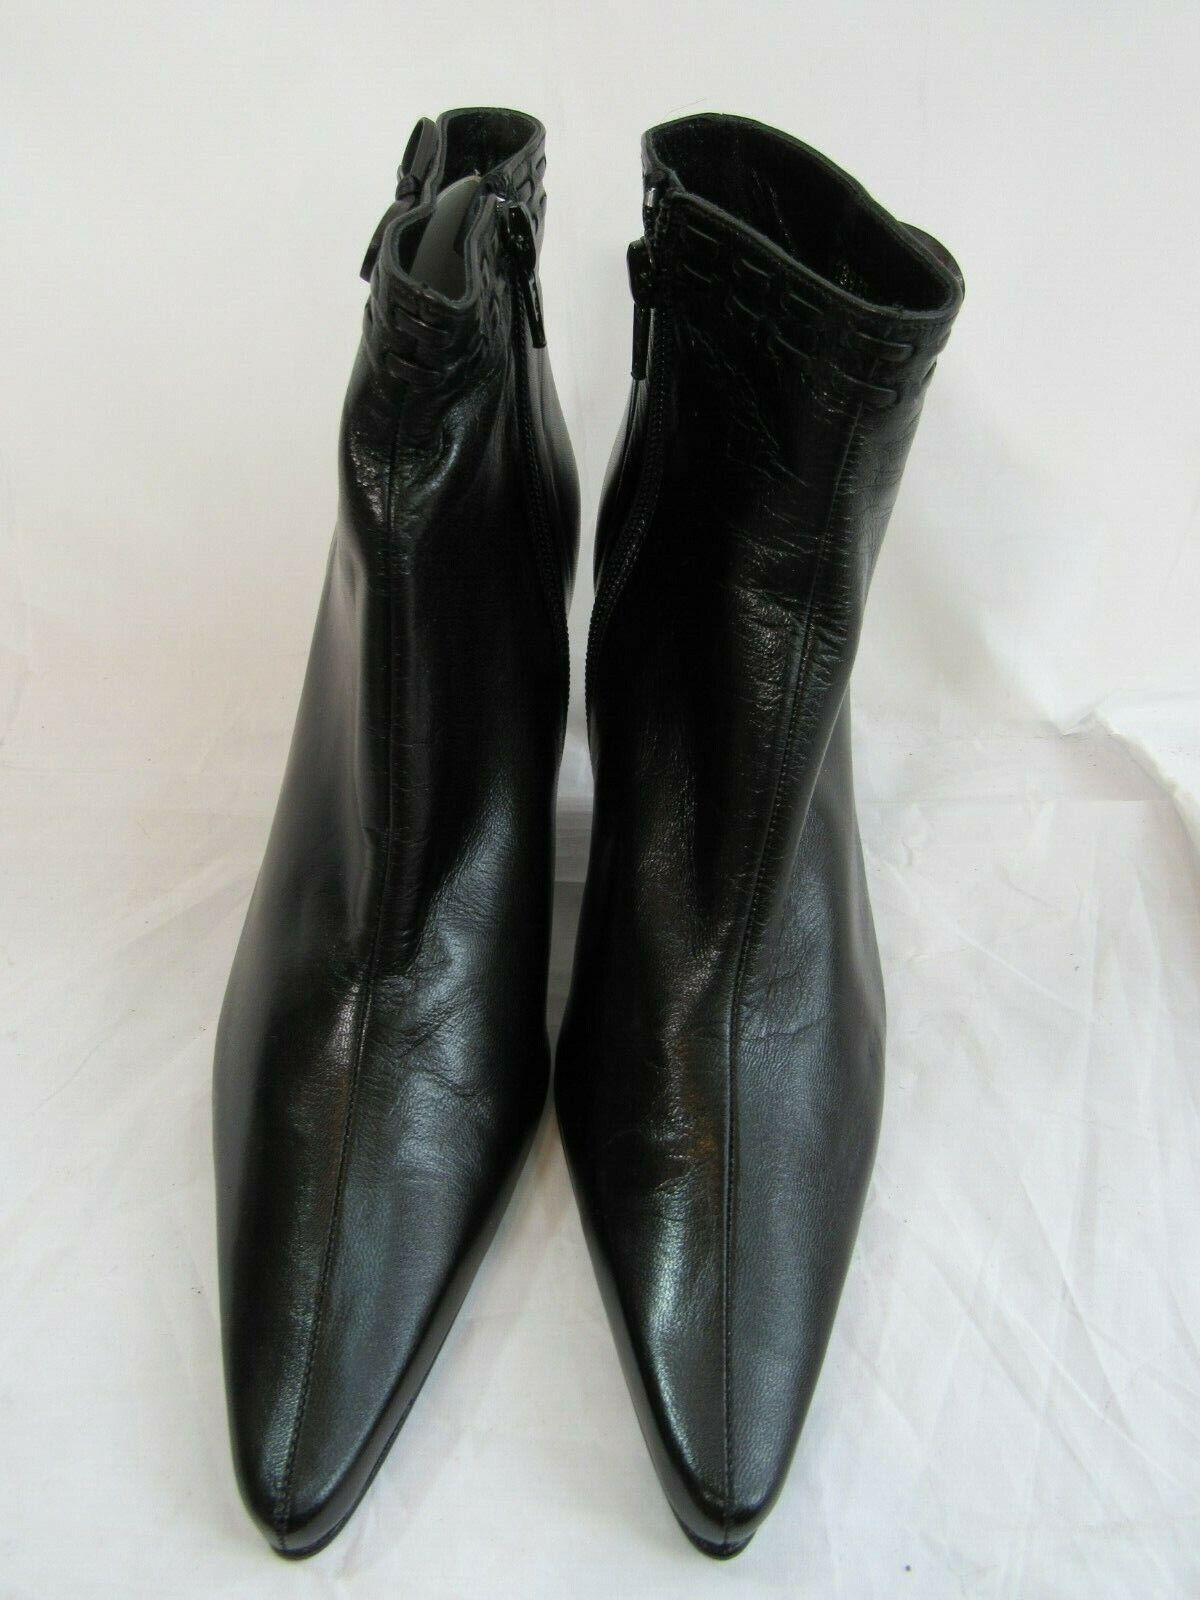 Delman Bota Al Tobillo Negro Usado En Excelente Condición tamaño 8M